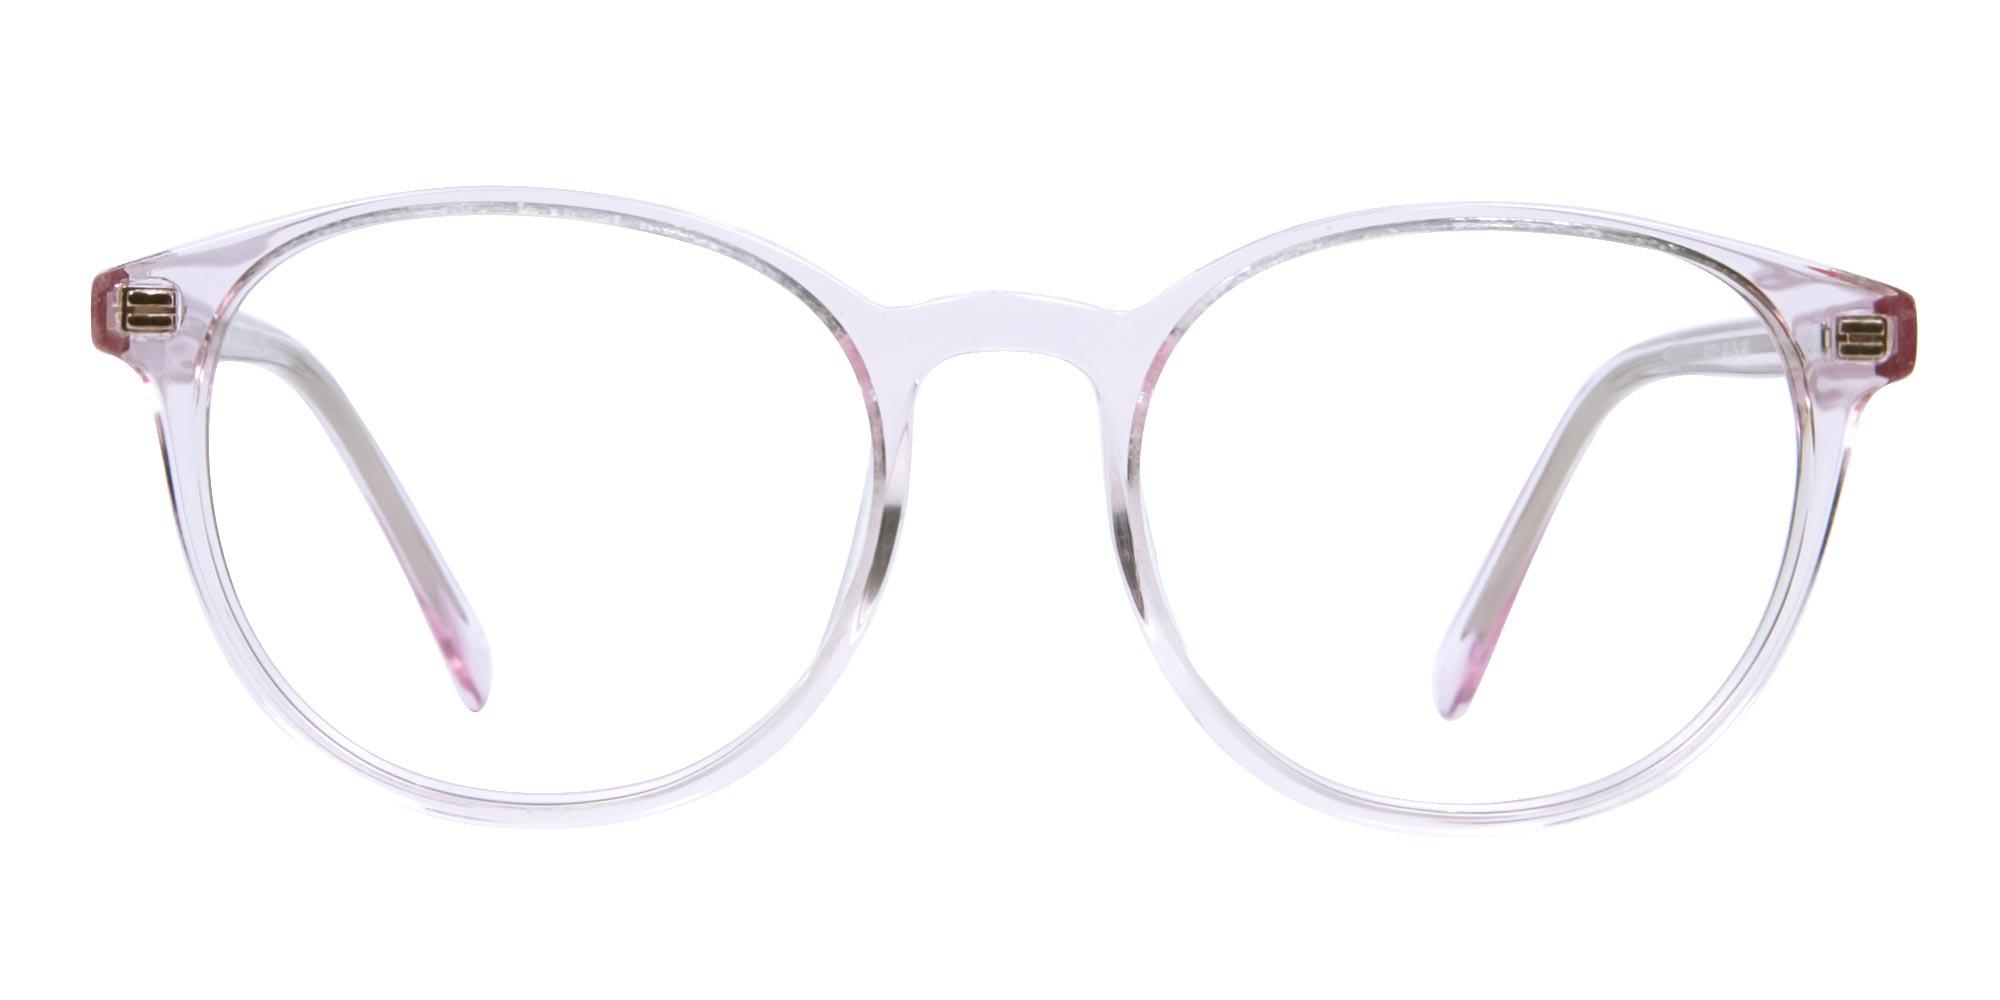 Transparent Pink Glasses for women